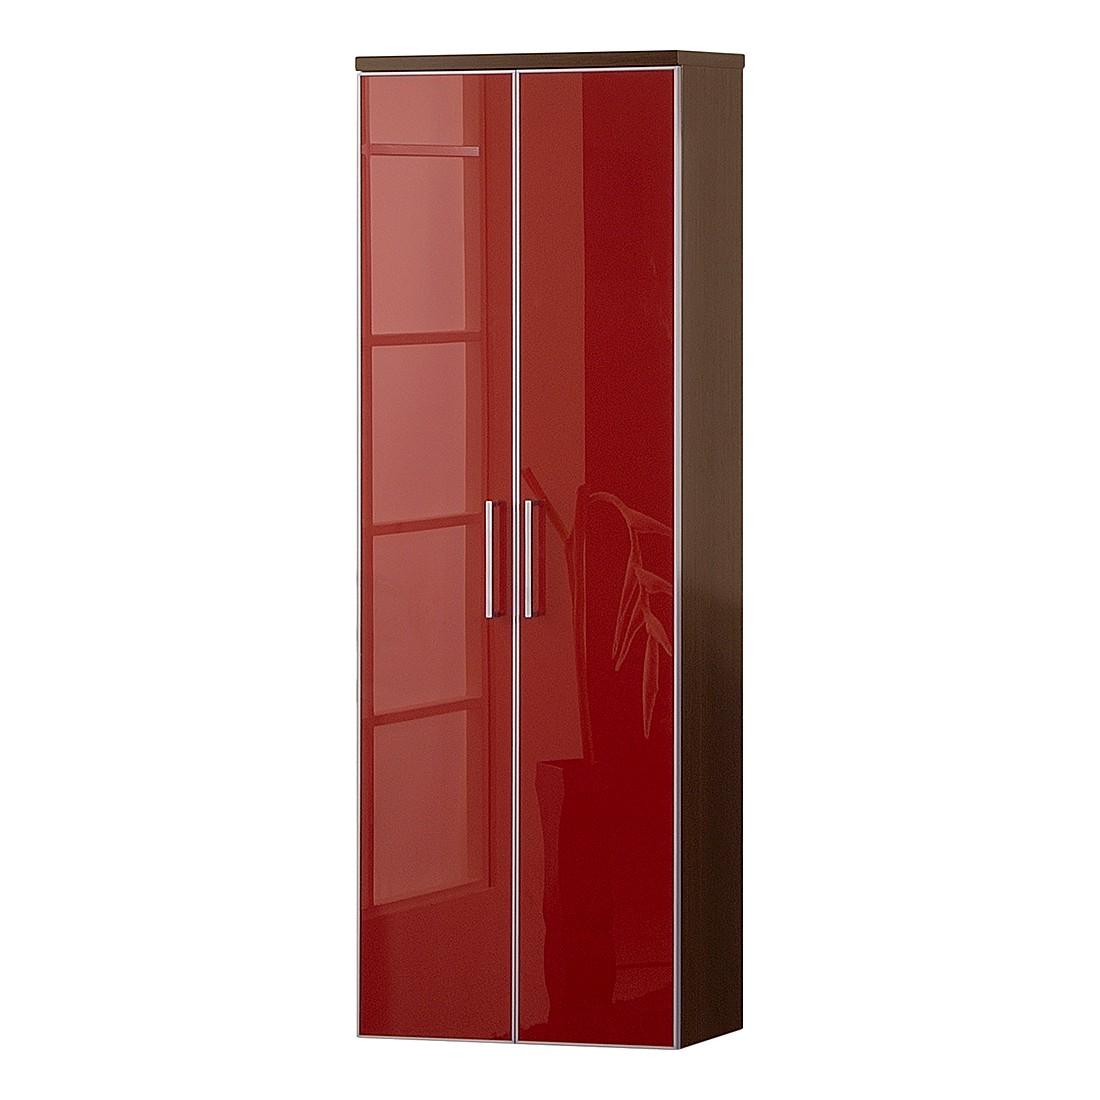 Hängeschrank Sarota II – Wenge/Glas Rot, Voss bestellen